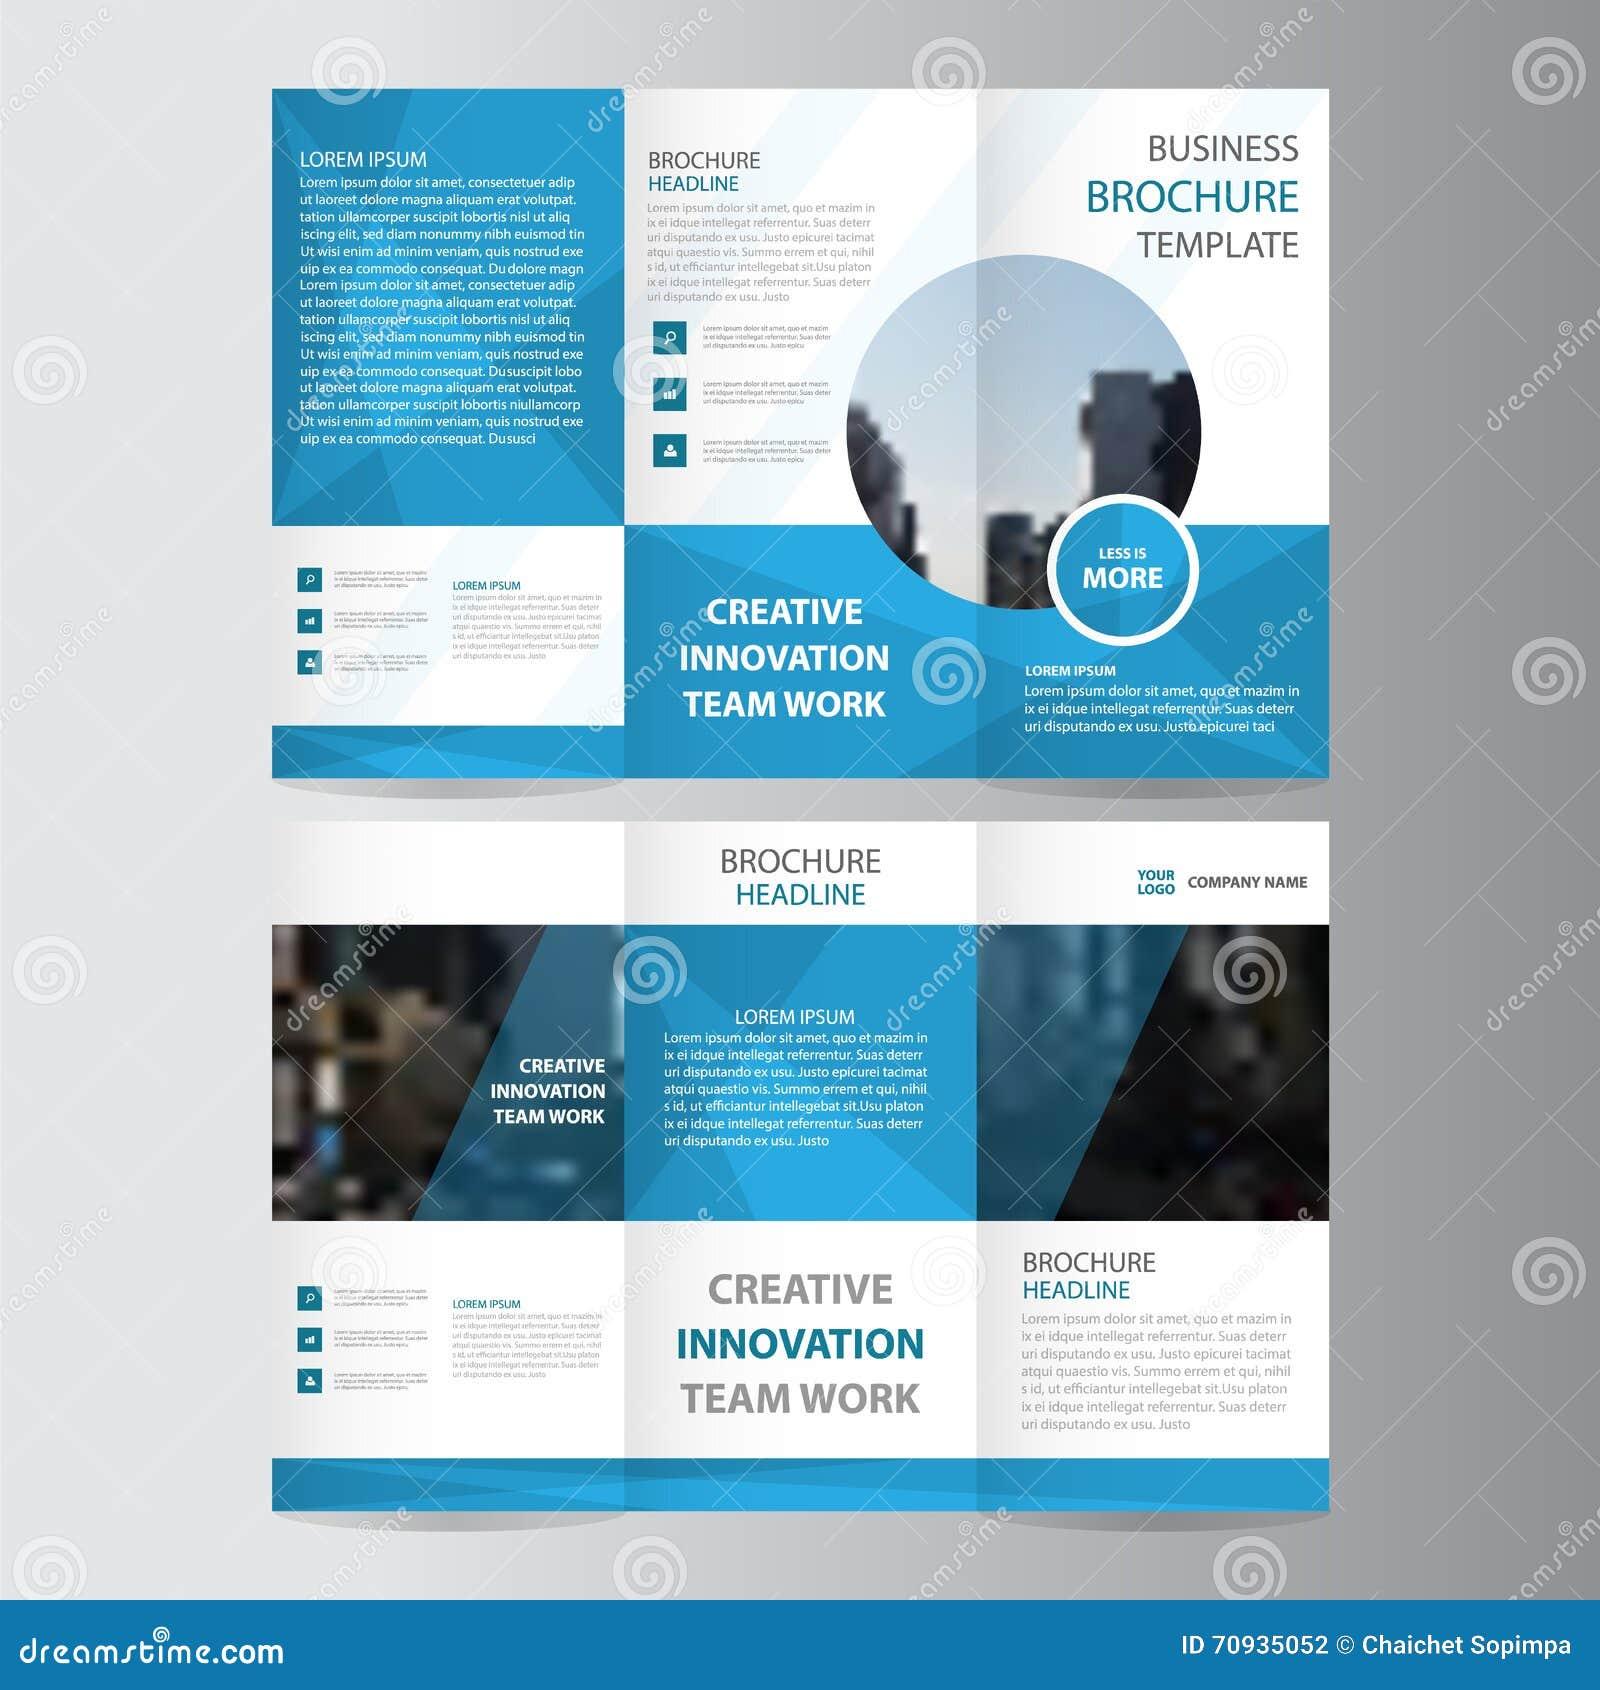 Blue flyer template dergi el ilan bro r kitap k kapak dzeni tasarm bask flashek Choice Image